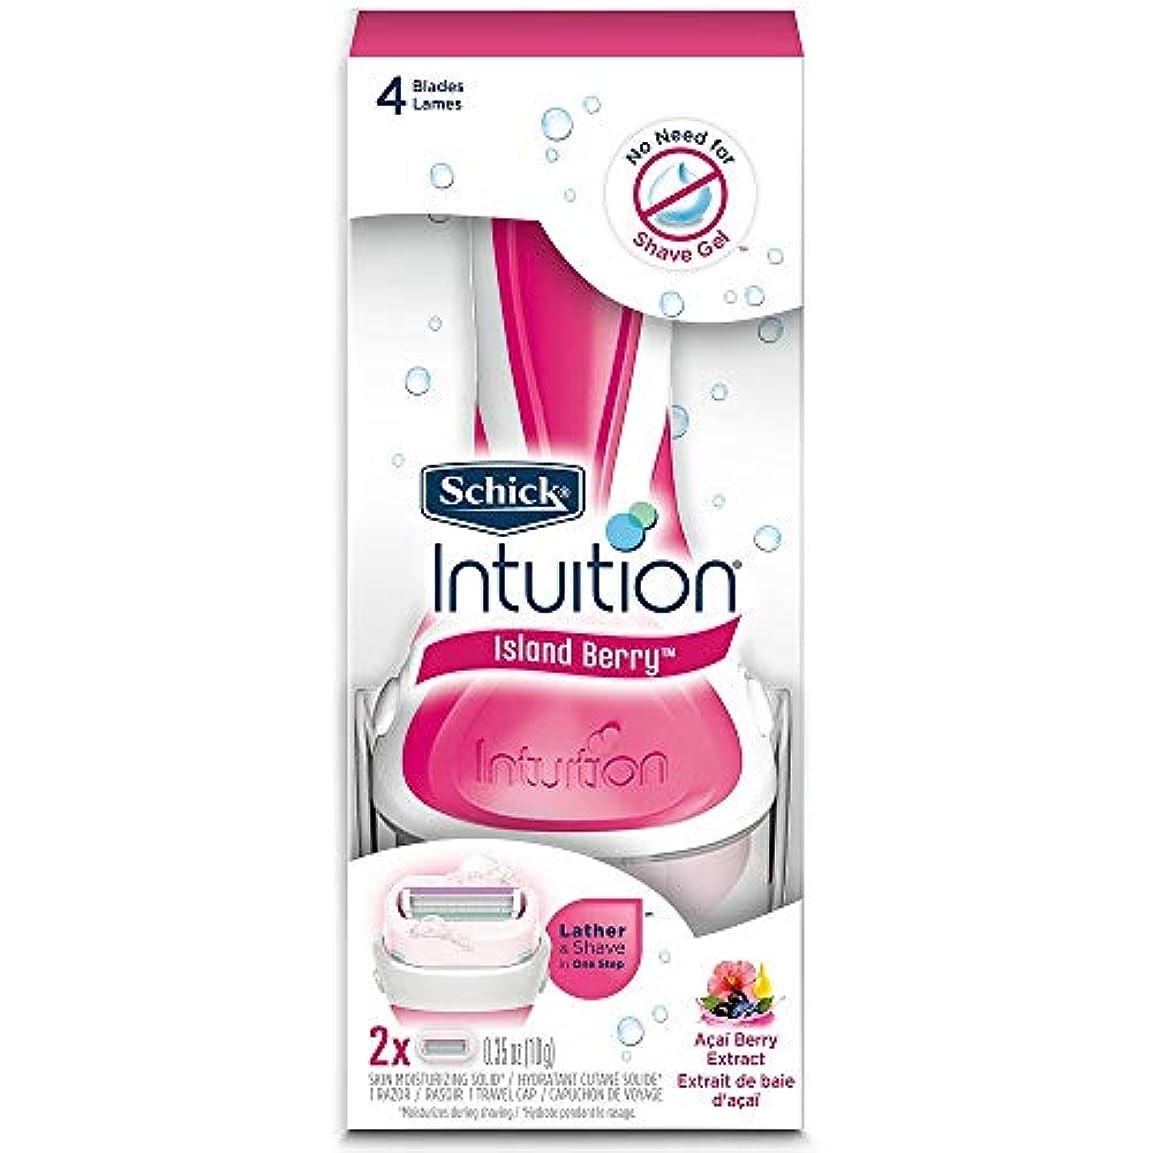 Schick Intuition Island Berry 2かみそりの刃の結め換え品を持つ女性のかみそり [並行輸入品]